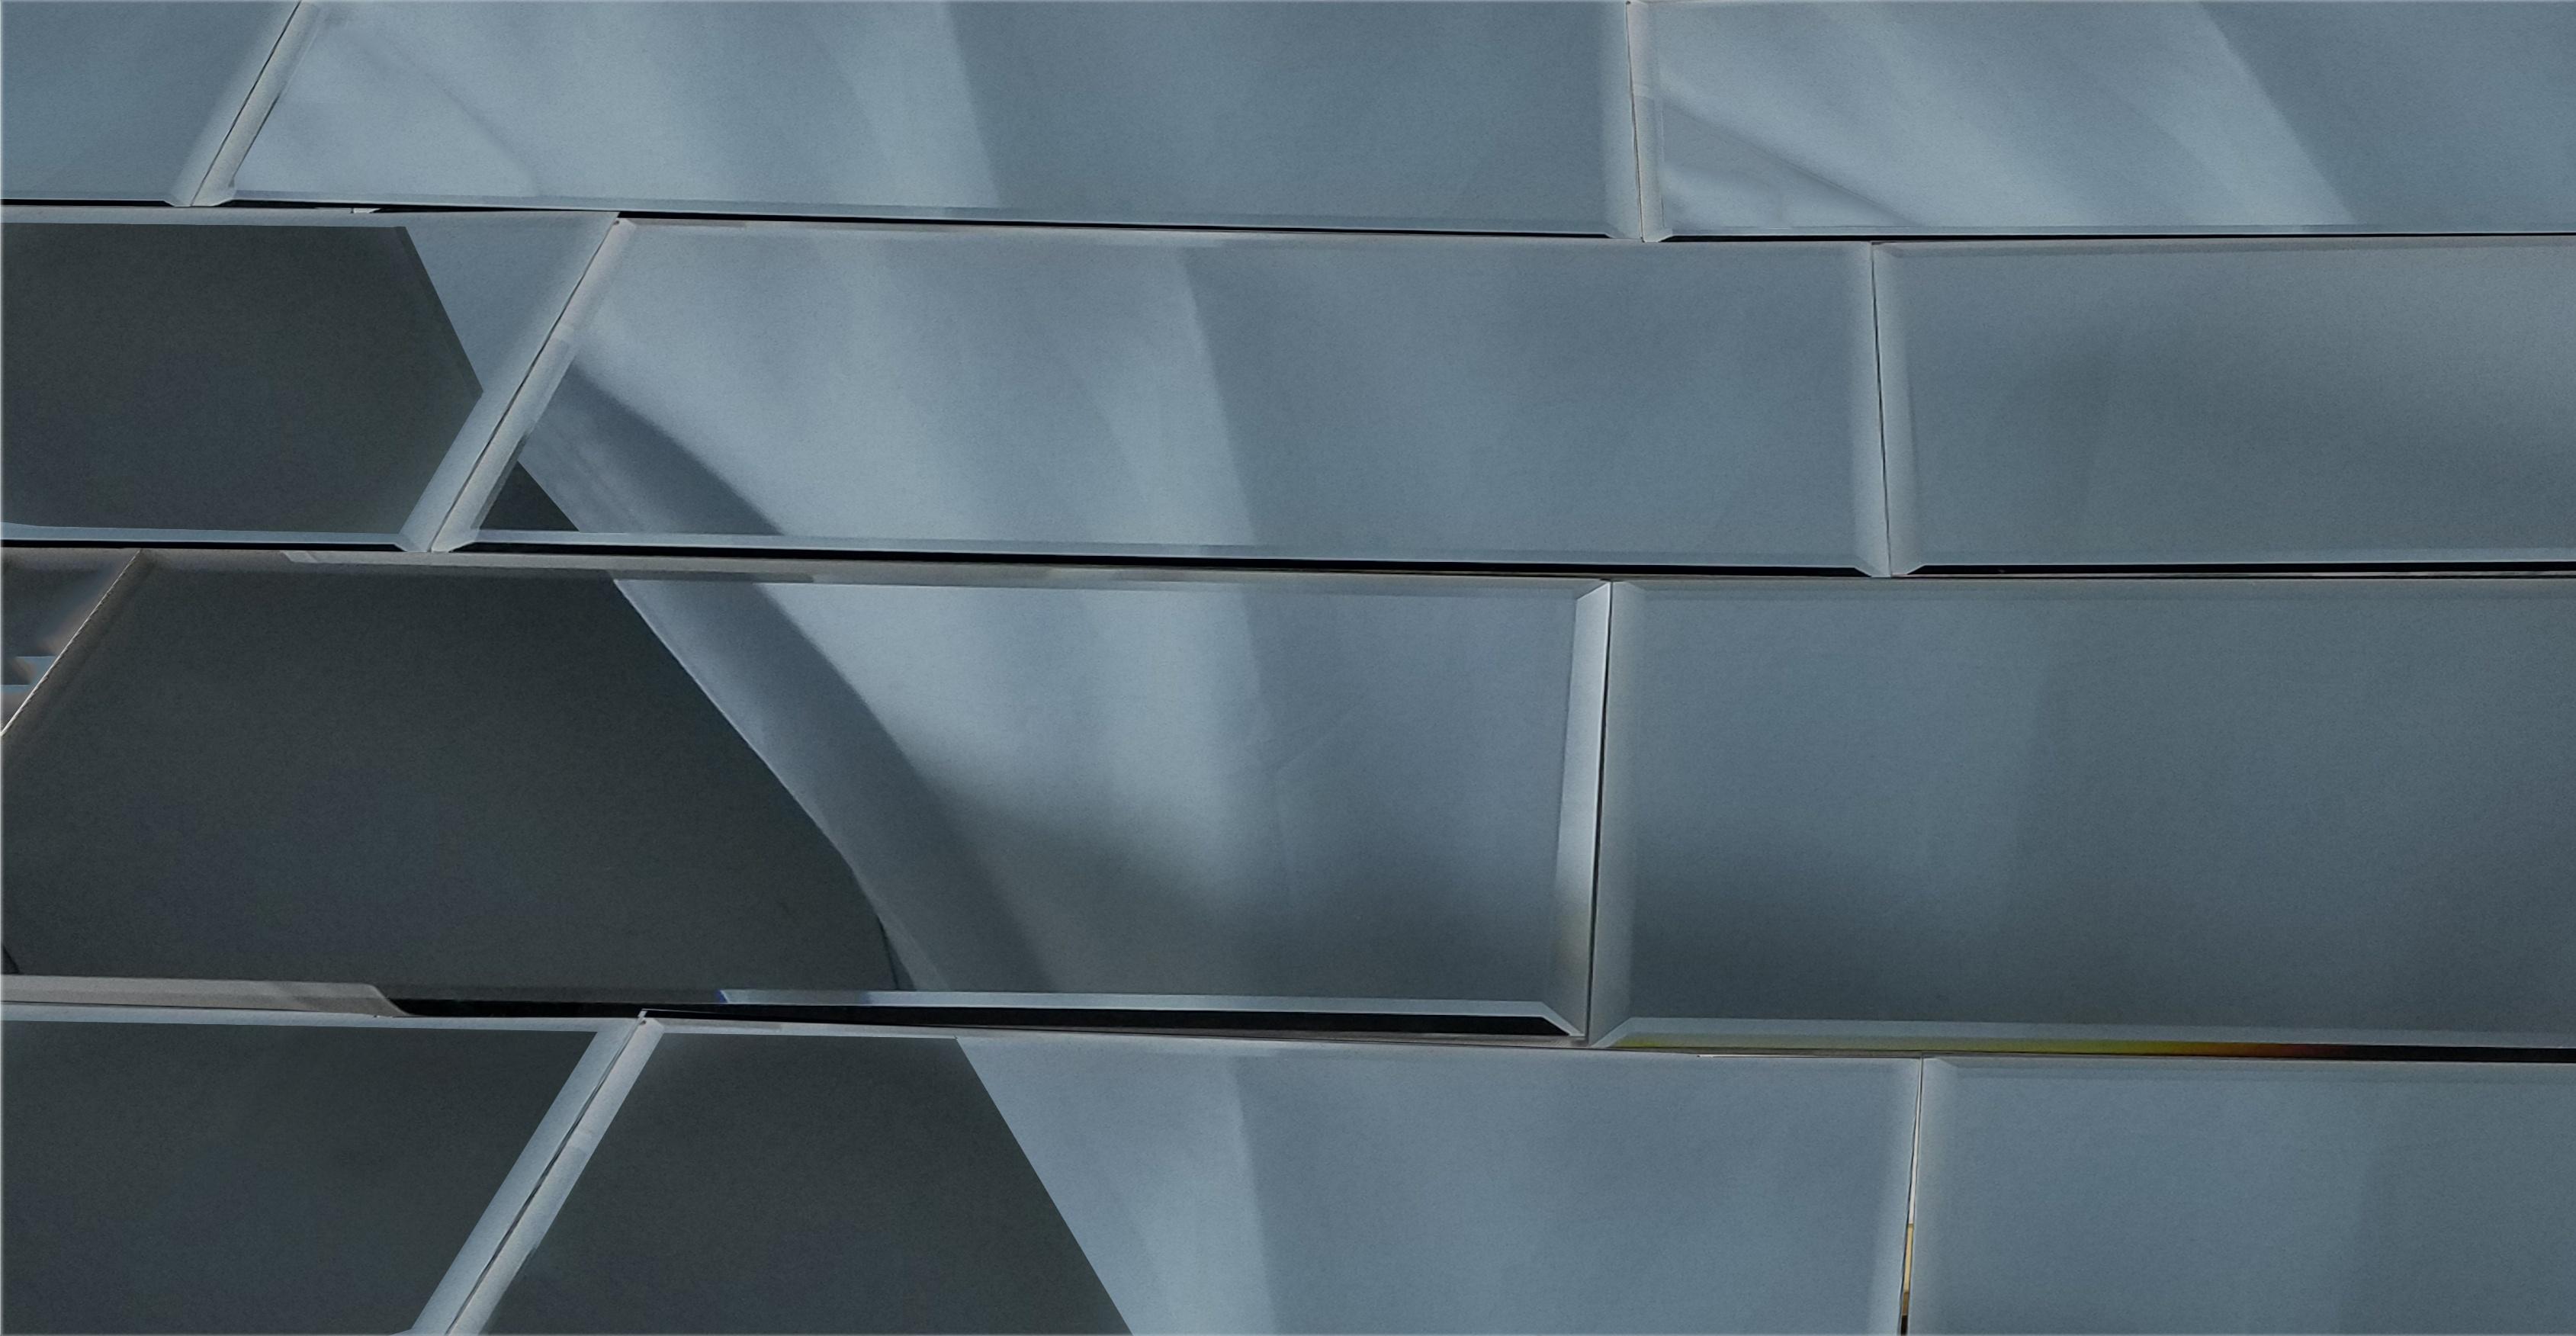 "Reflections 12"" x 24"" Glossy Gray Mirror Field Backsplash Wall Tile"